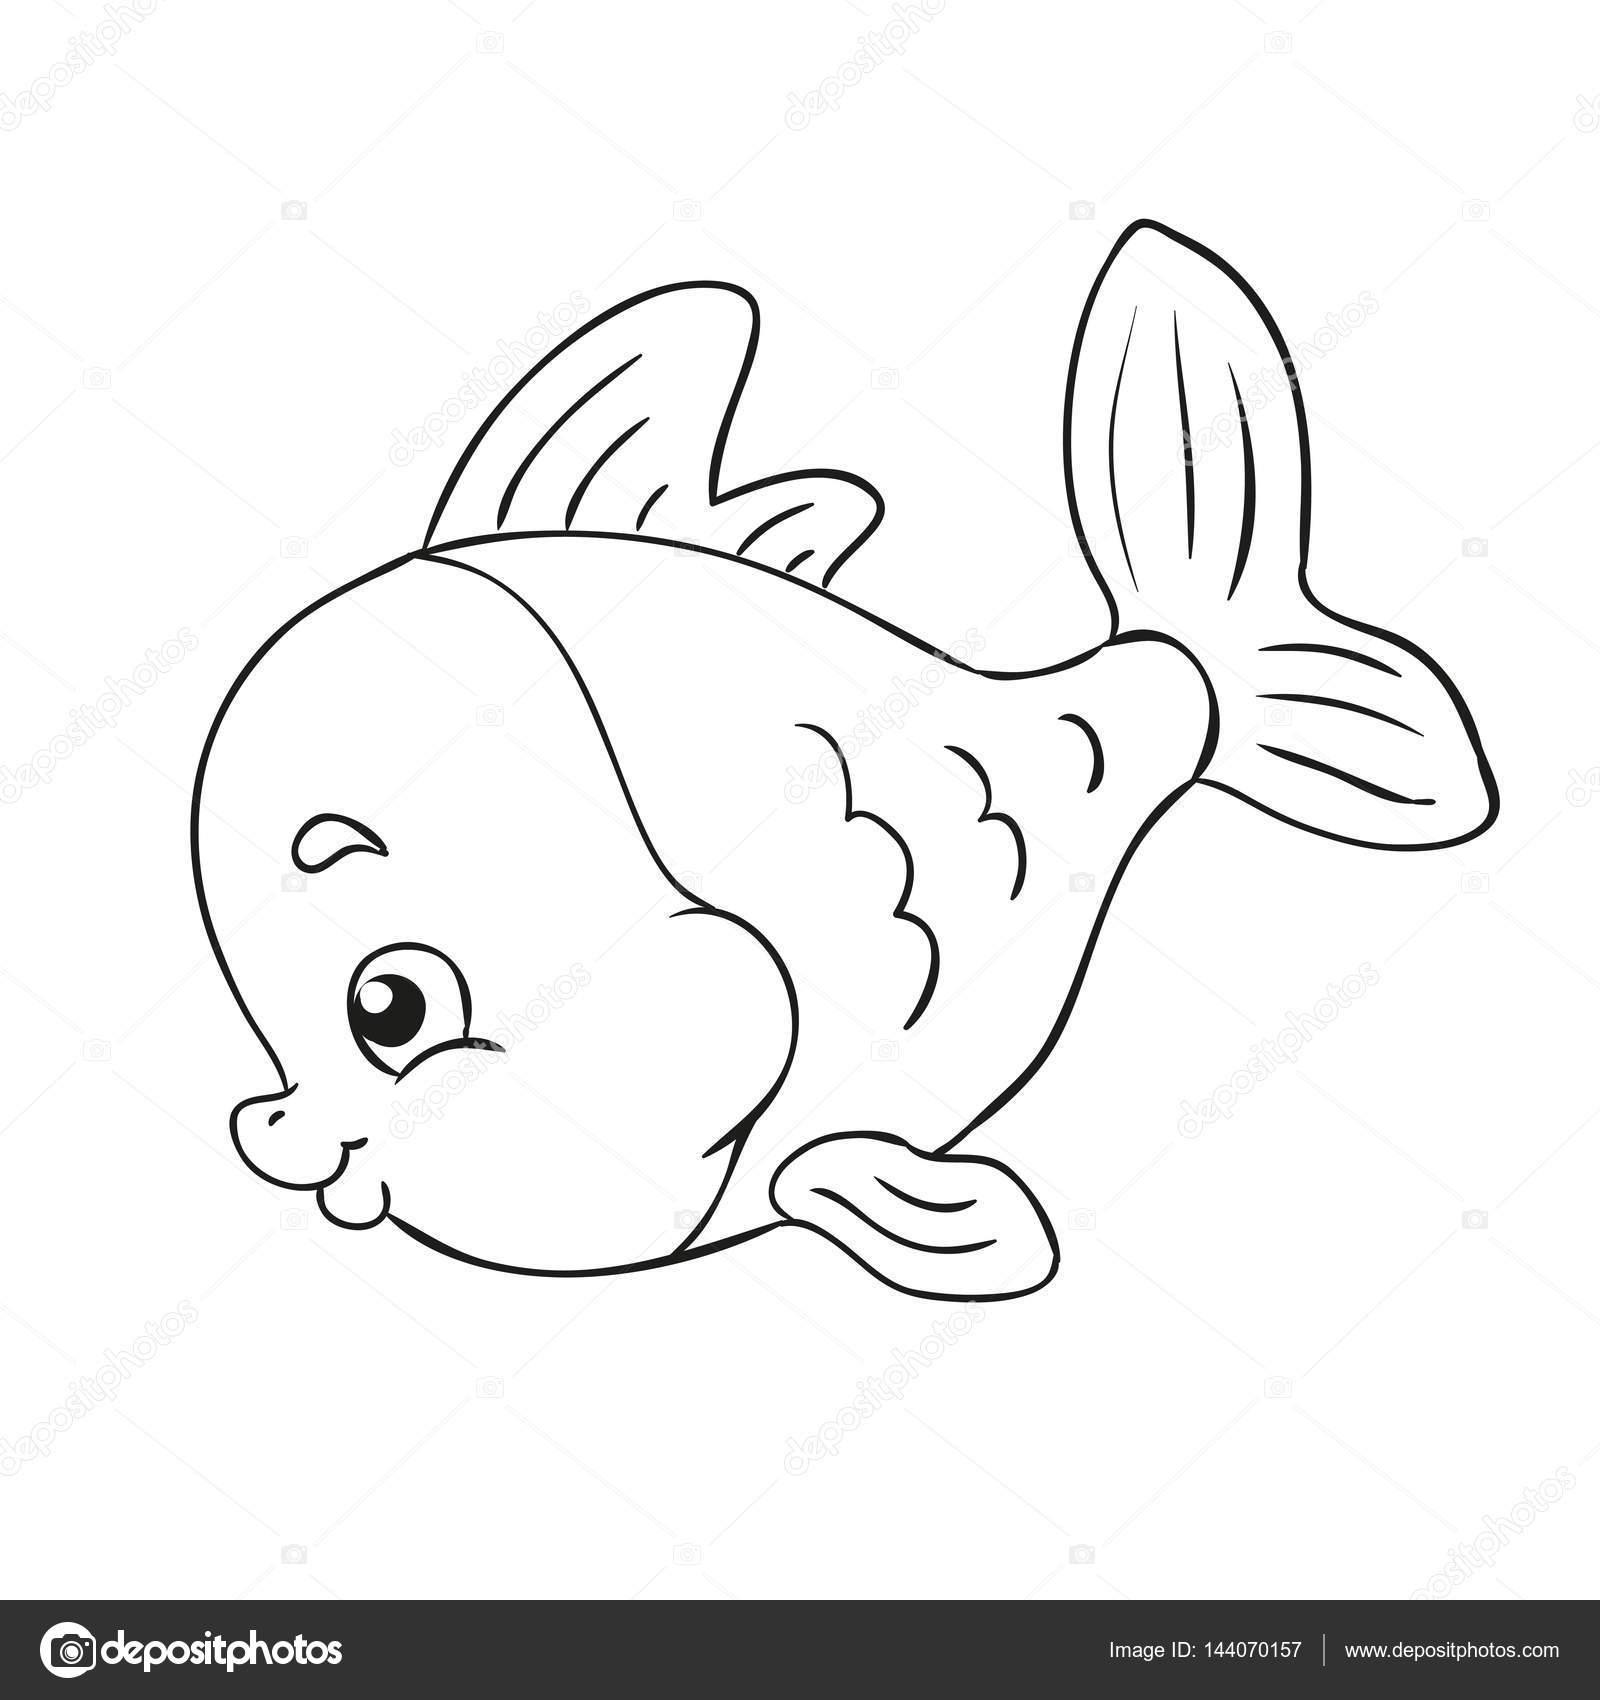 Pequeño pez. Contorno negro para colorear libro. Contorno de vector ...